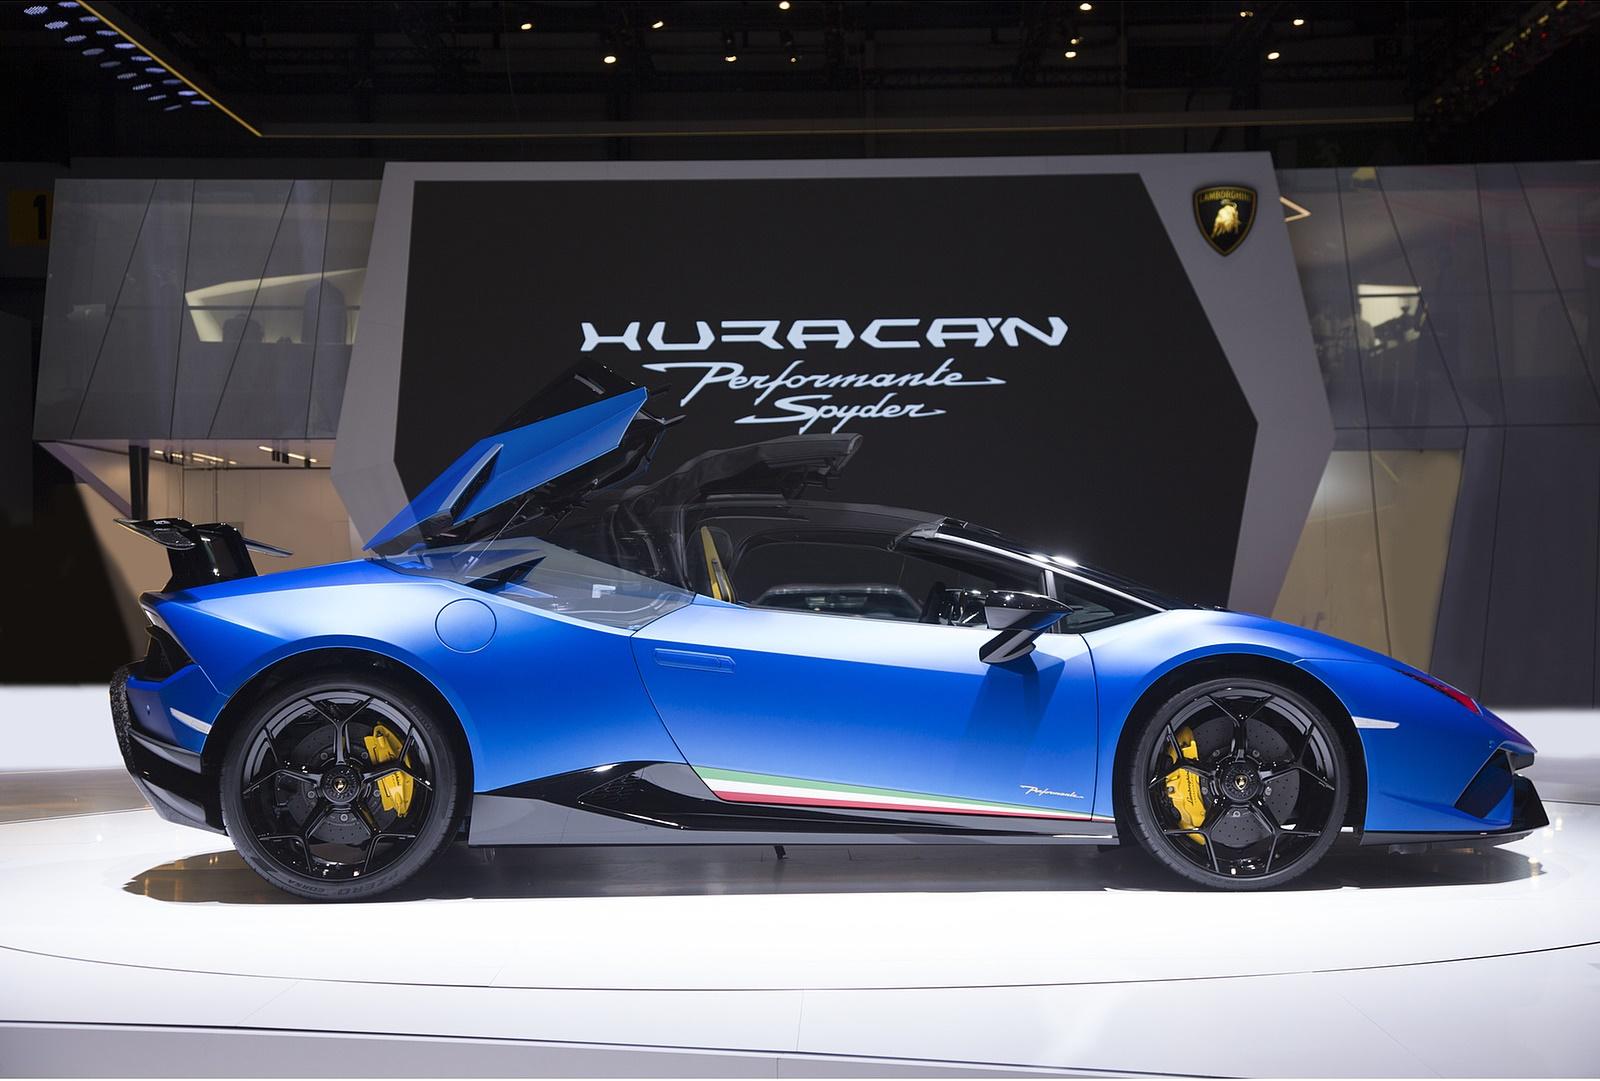 2019 Lamborghini Huracan Performante Spyder Side Wallpaper 85 Hd